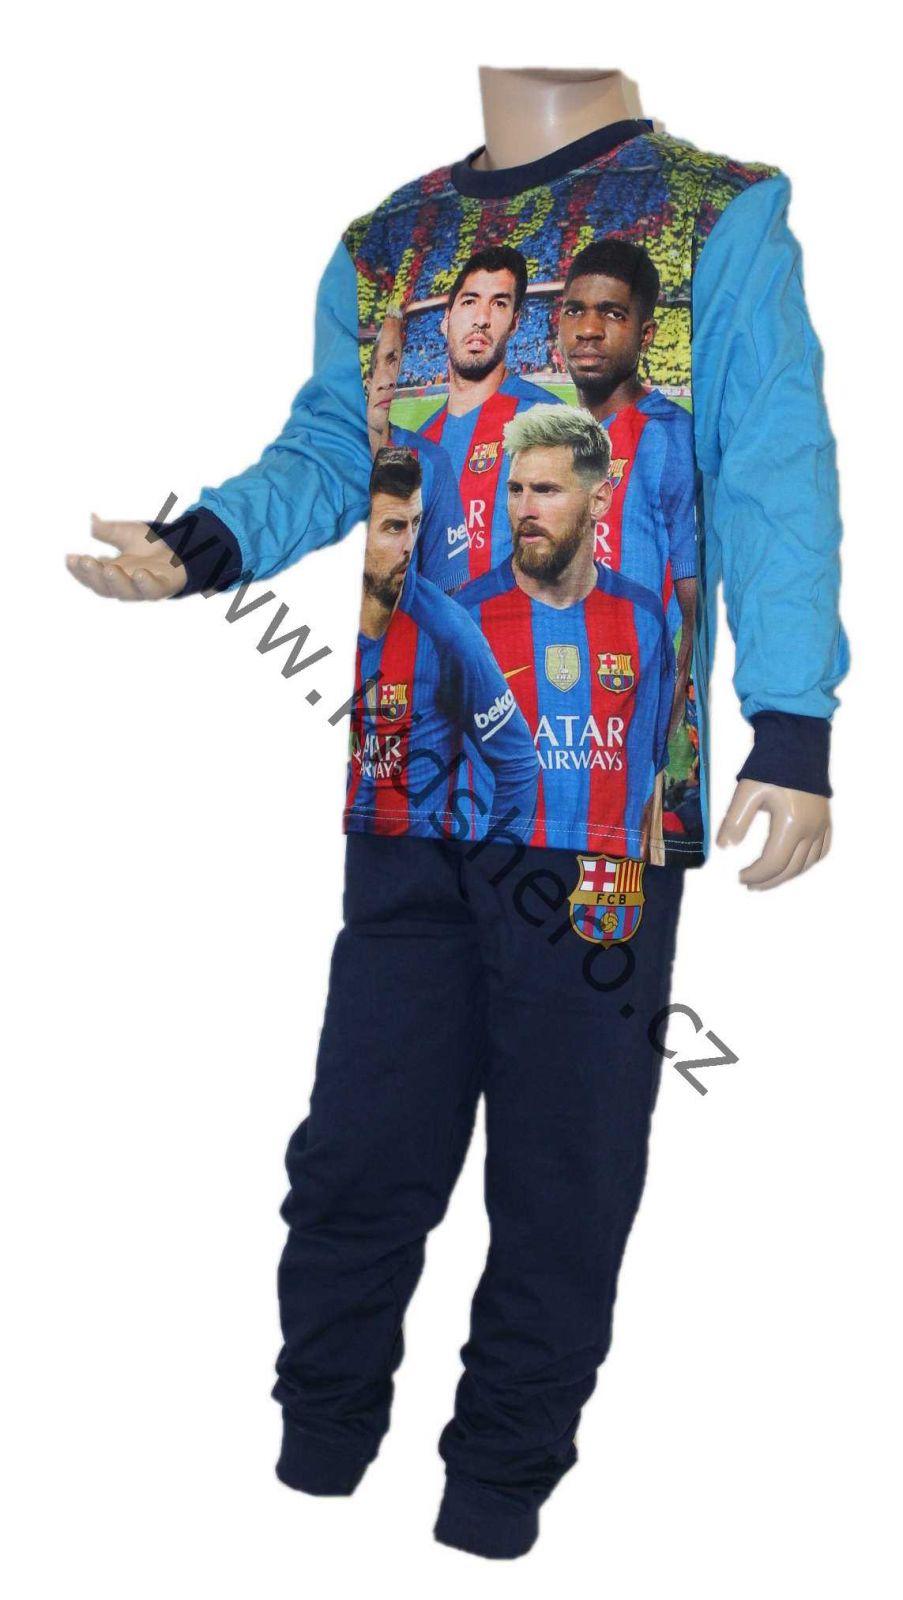 Dětské pyžamo FC BARCELONA, chlapecké pyžamo fotbal, pyžamo barcelona